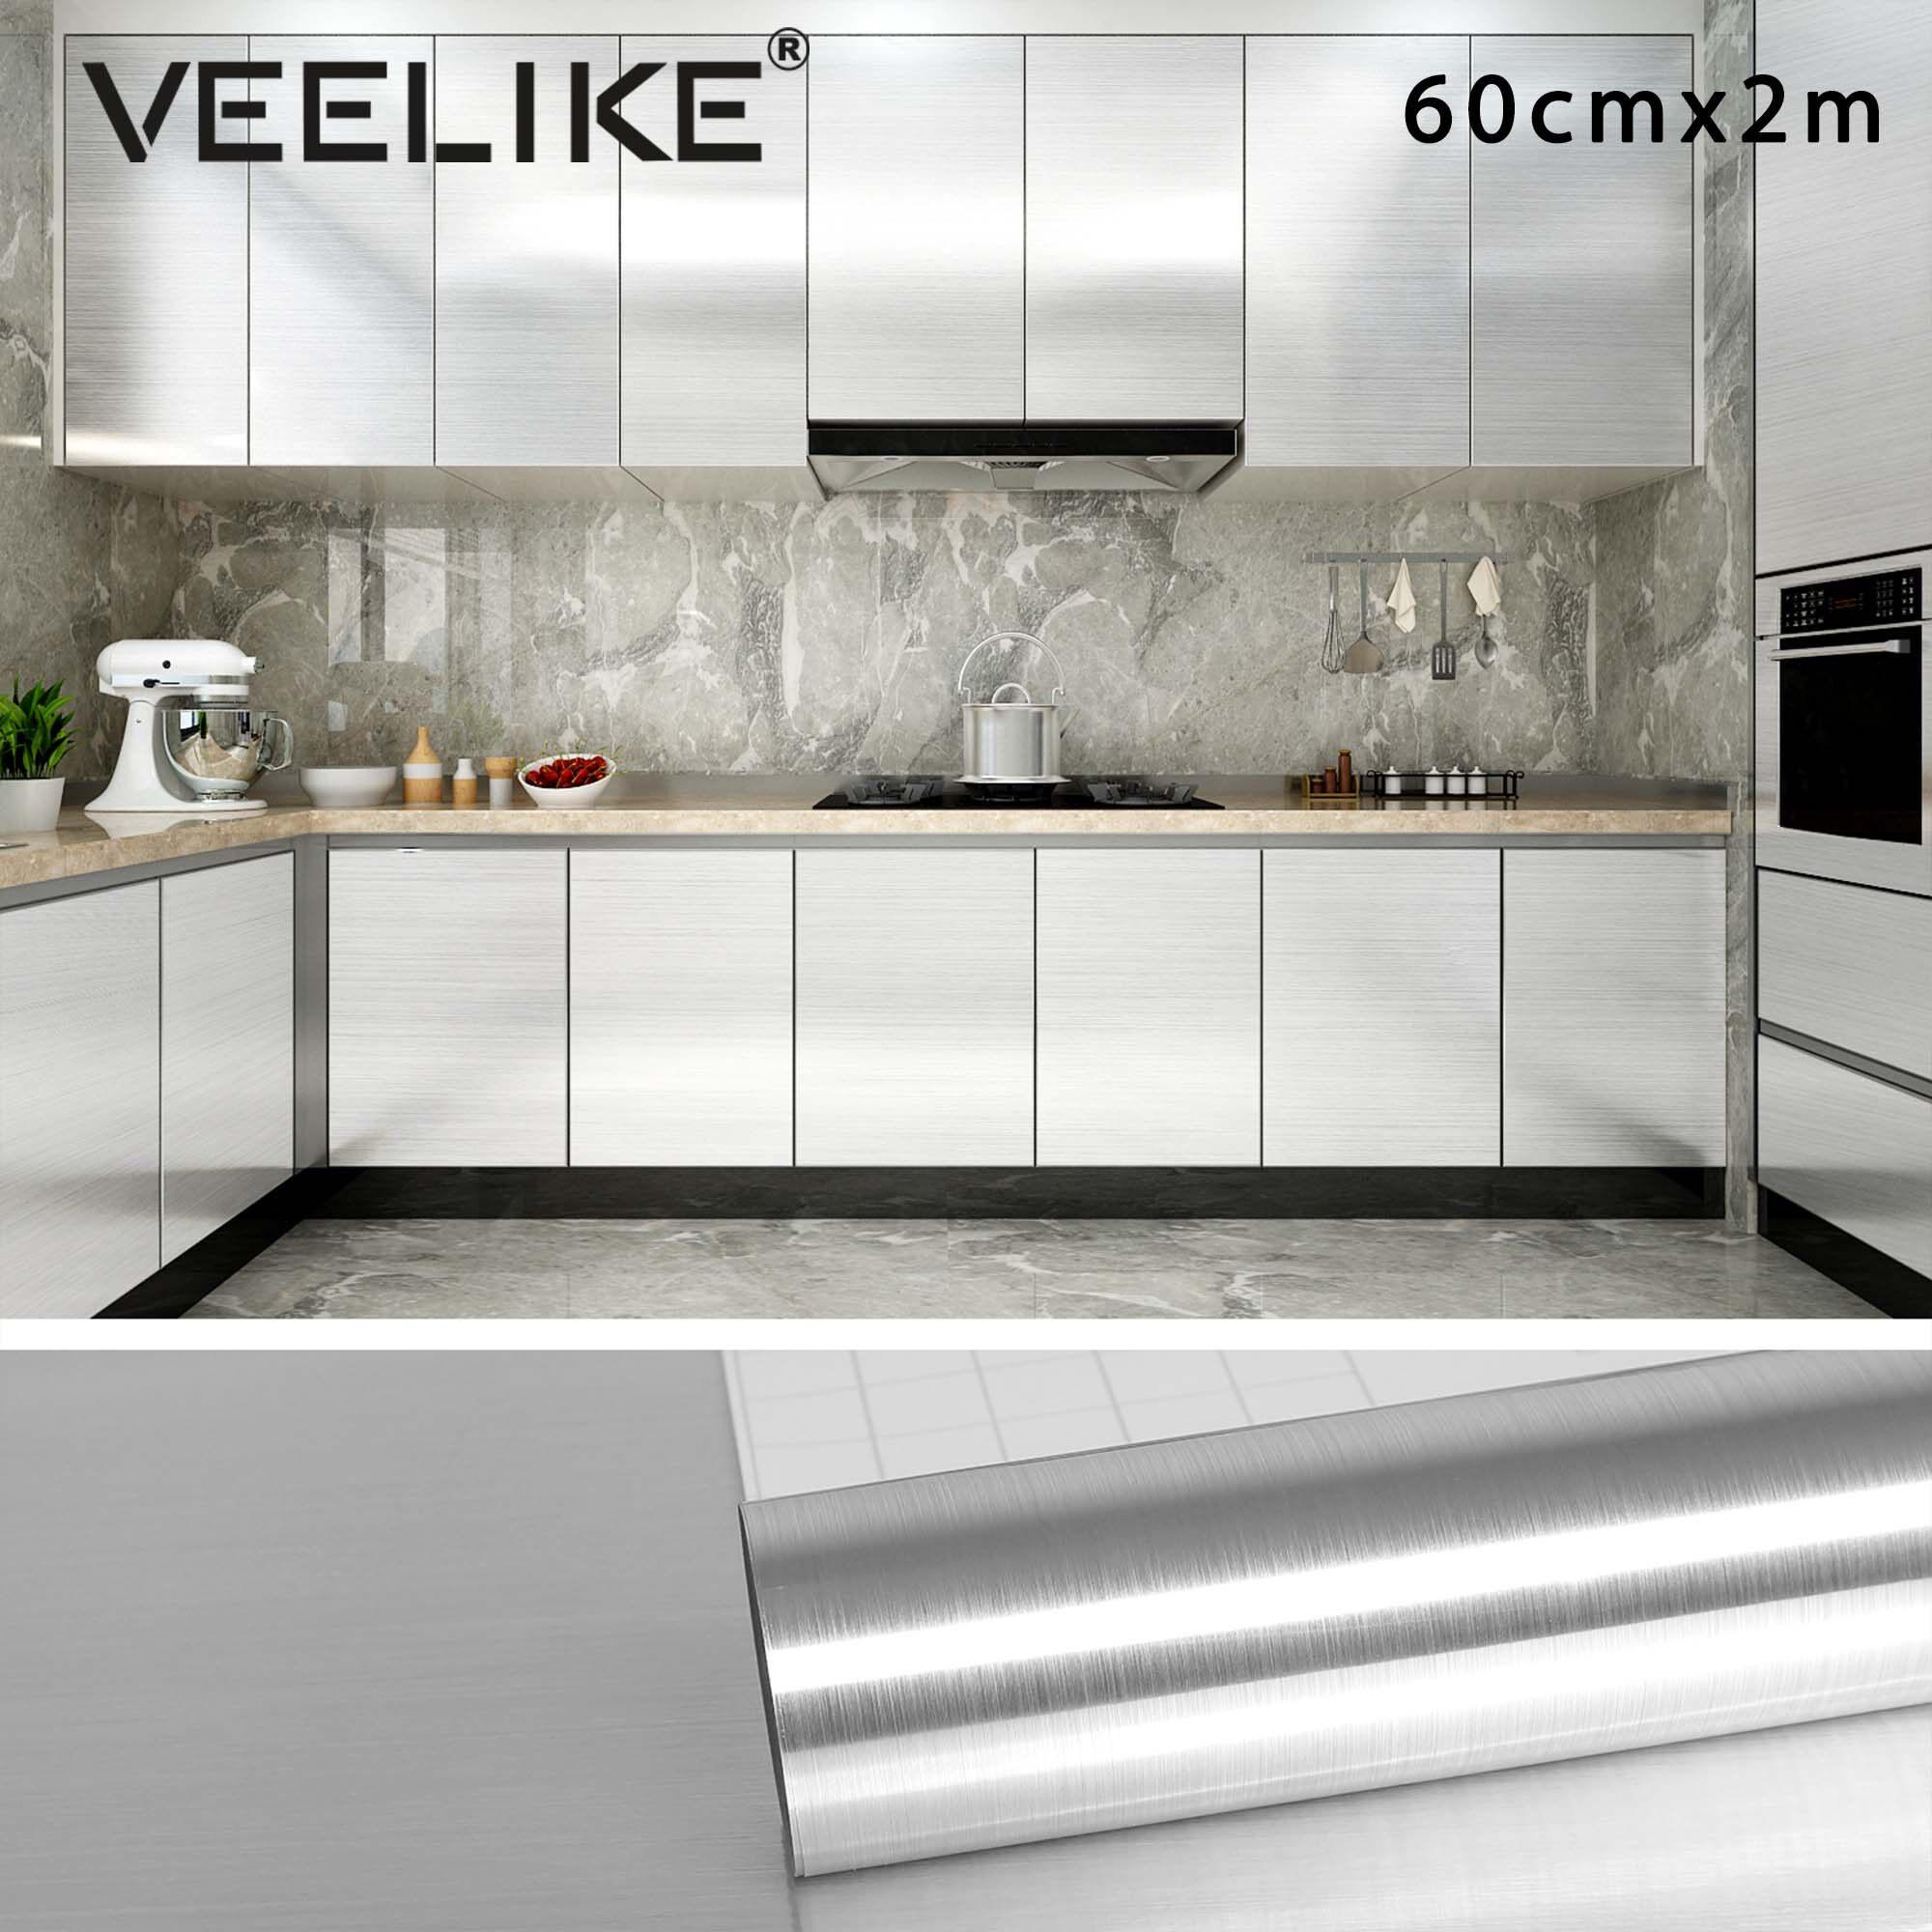 Veelike Brushed Silver Self Adhesive Wall Sticker Heat Resistant